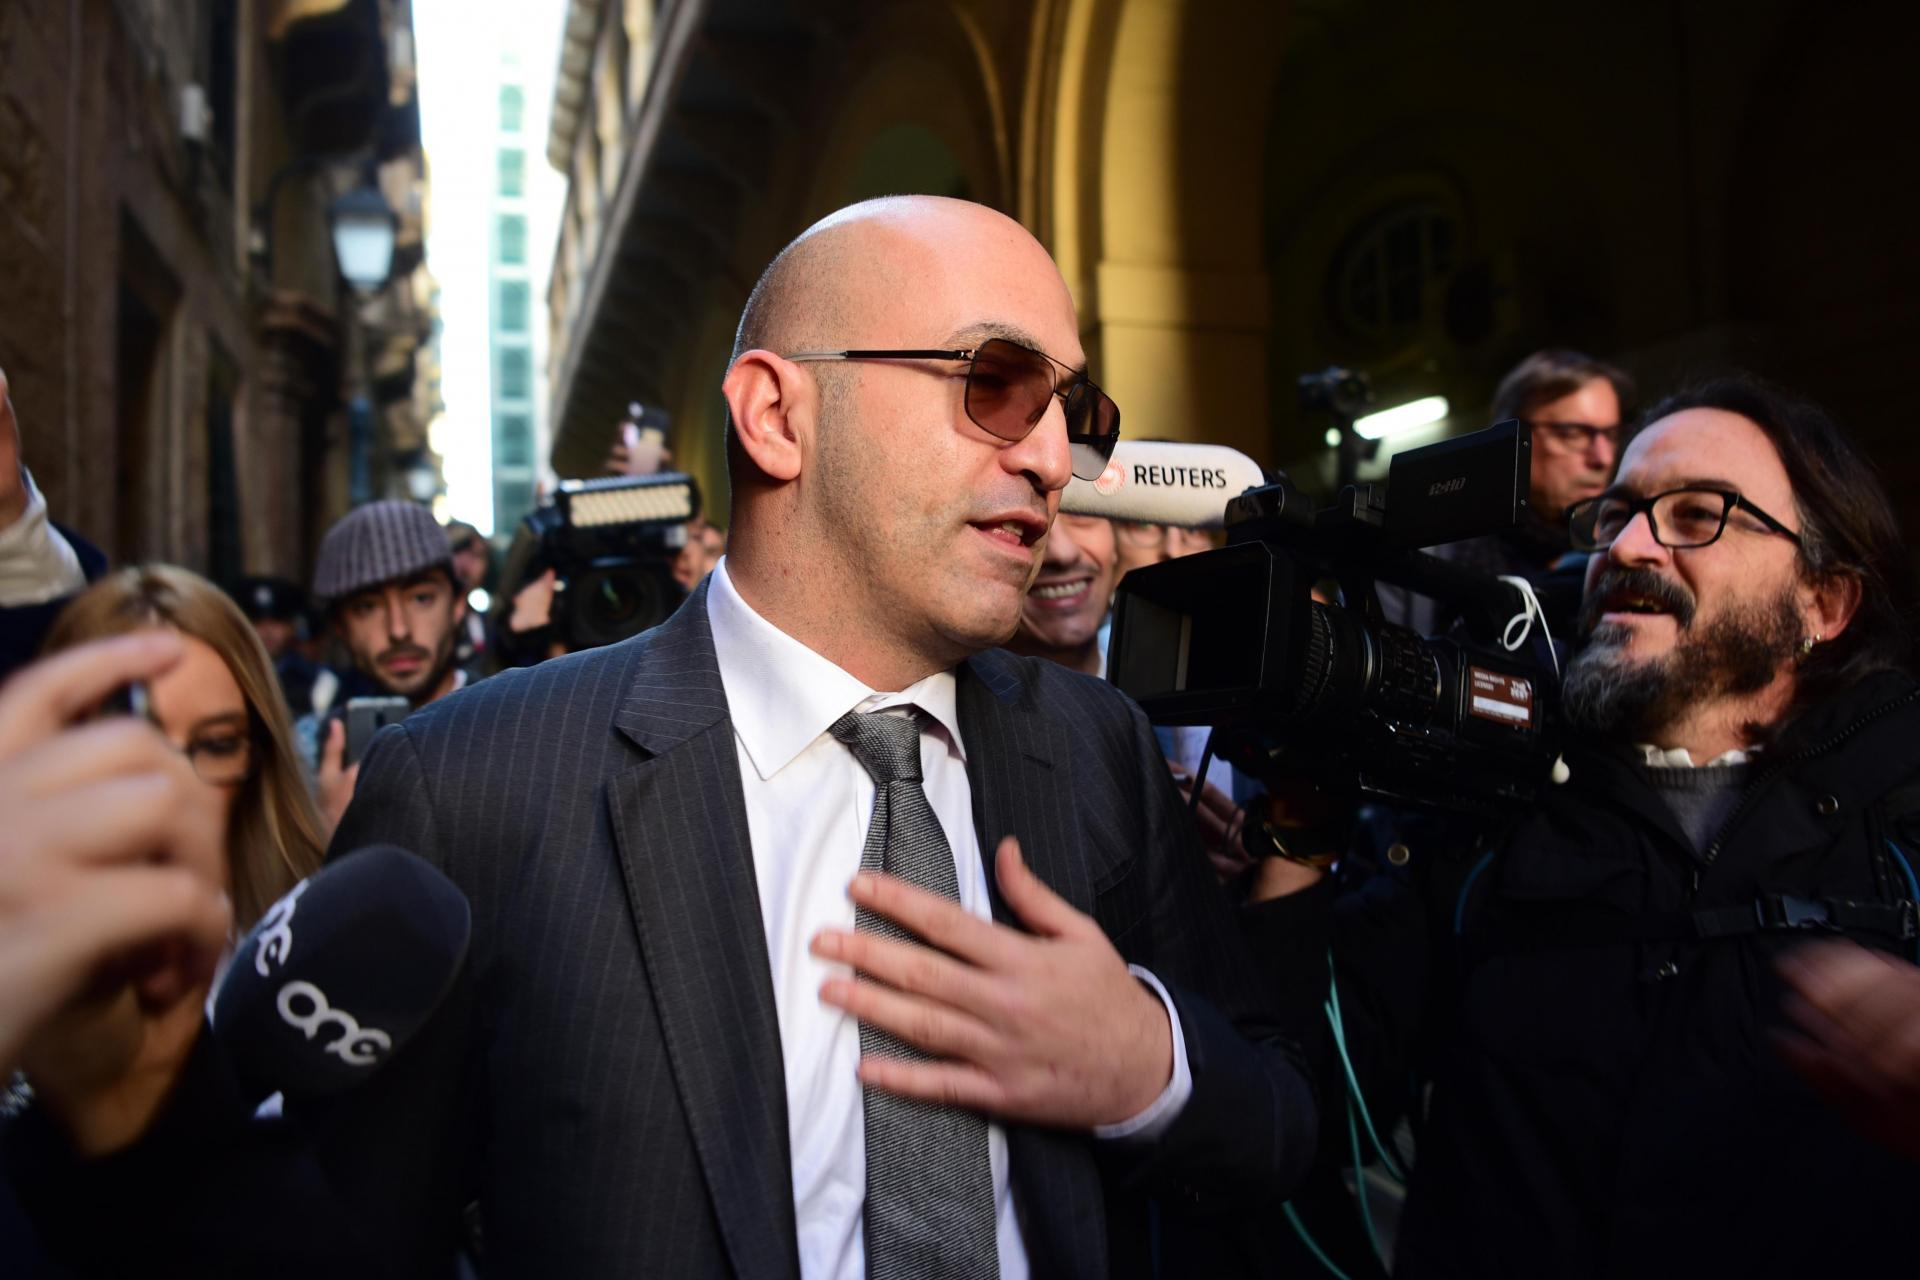 Yorgen Fenech has been charged with conspiring to murder Daphne Caruana Galizia. Photo: Mark Zammit Cordina